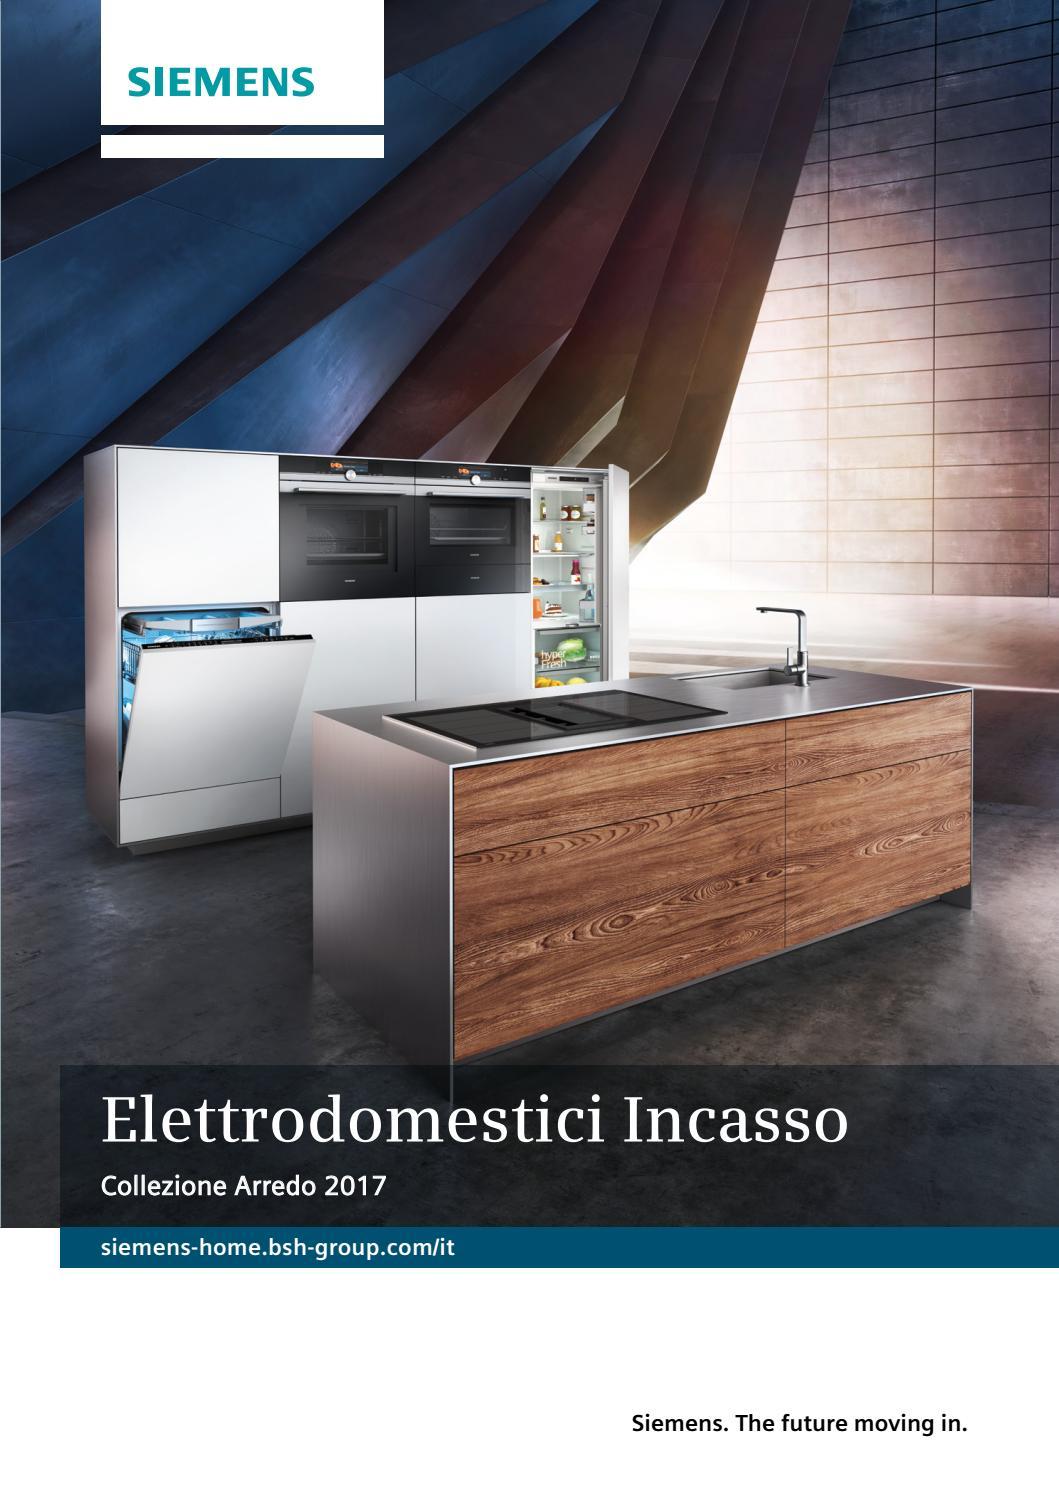 siemens arredo 2017 incasso by duegstore.com - issuu